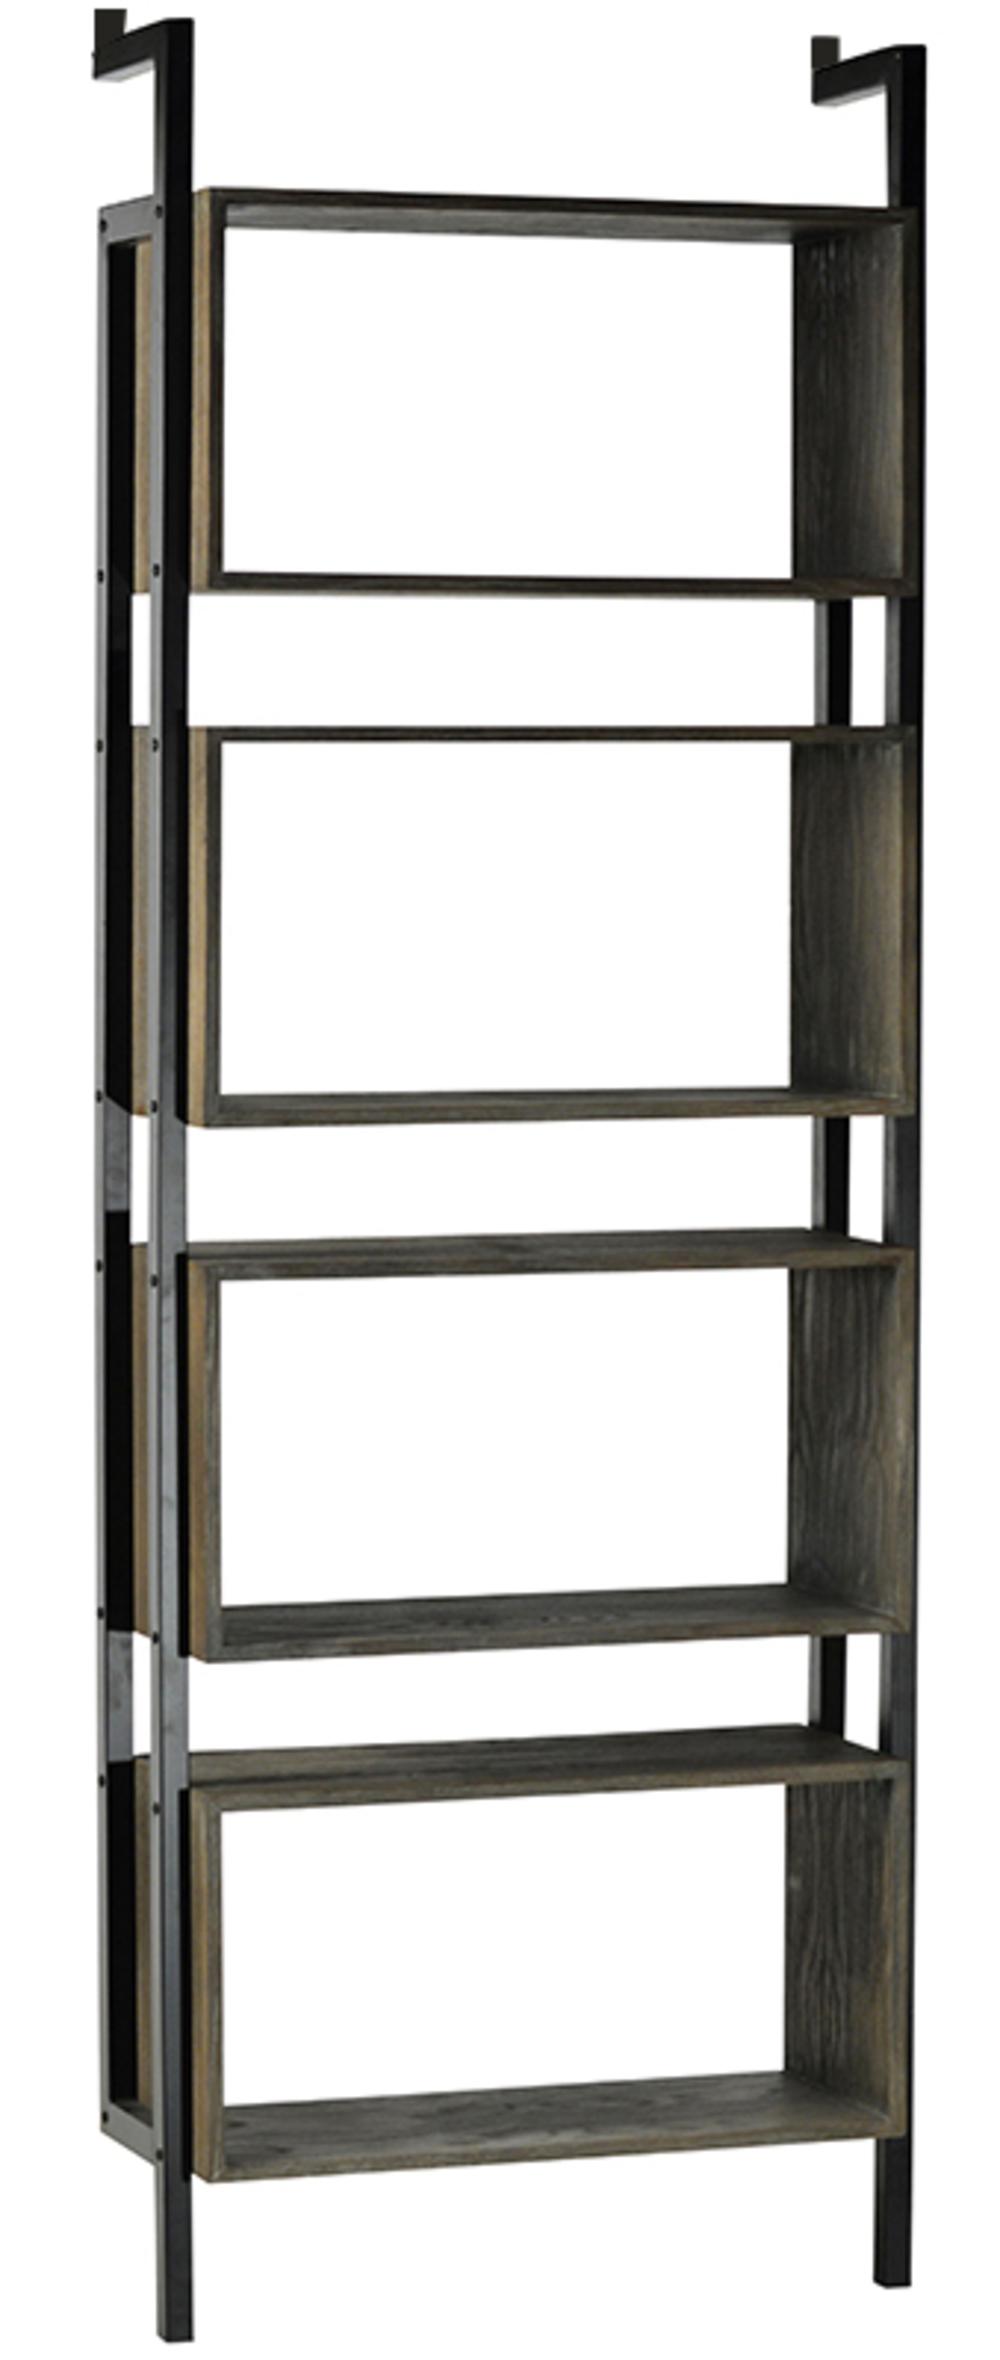 Dovetail Furniture - Crowley Bookcase